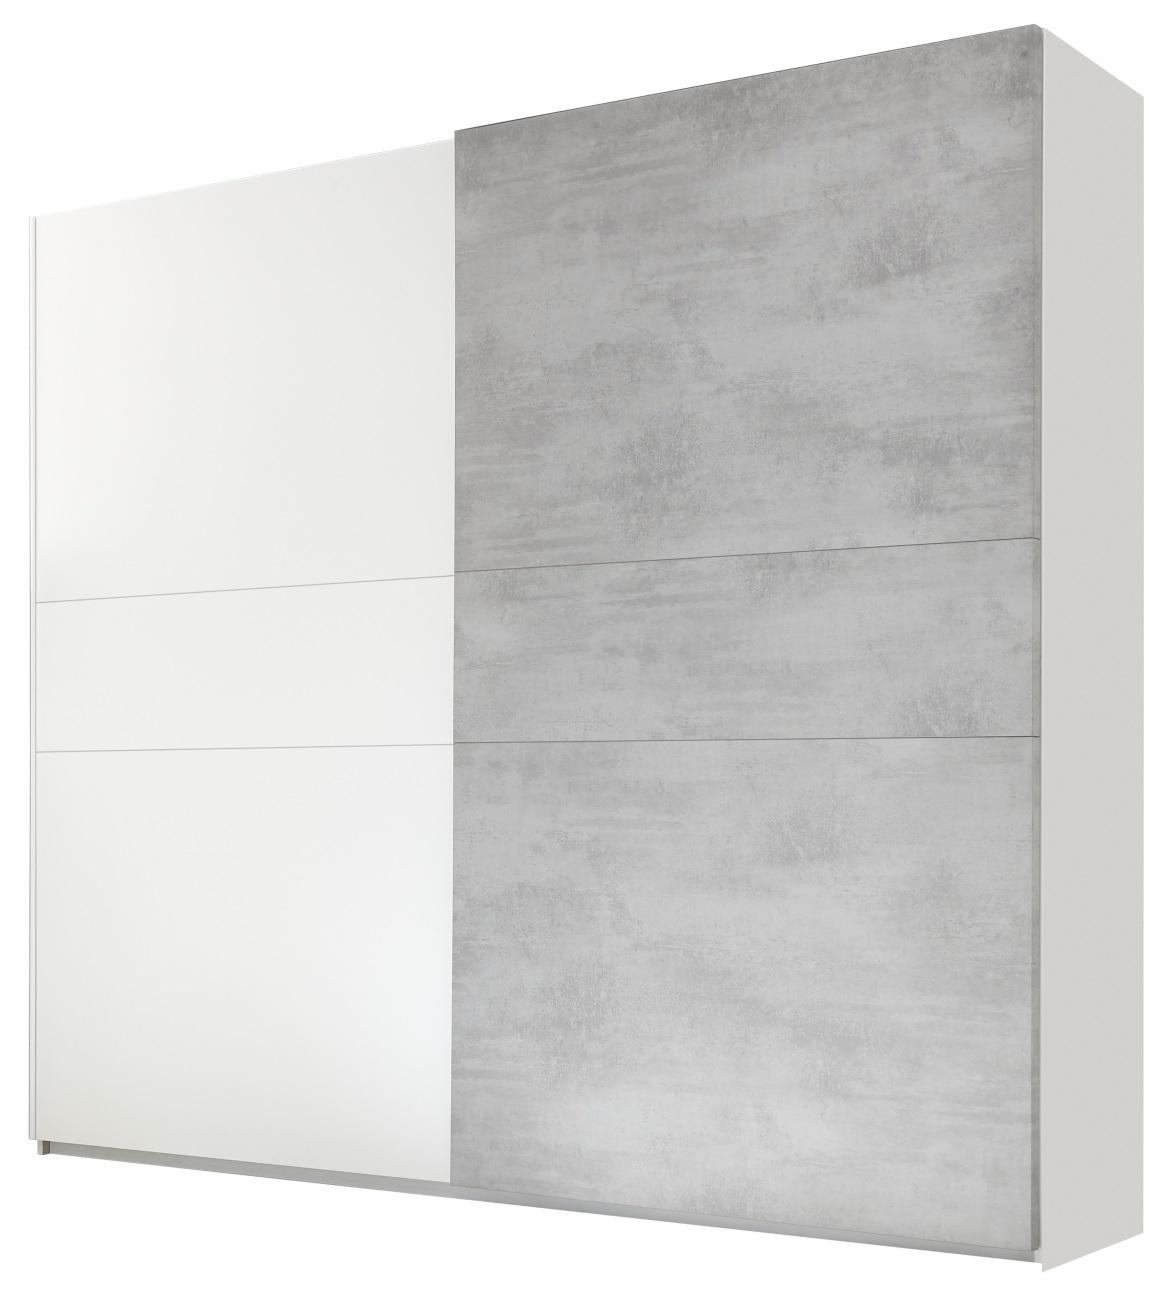 Kledingkast Amalti 220 cm breed in mat wit met grijs beton   Pesaro Mobilia